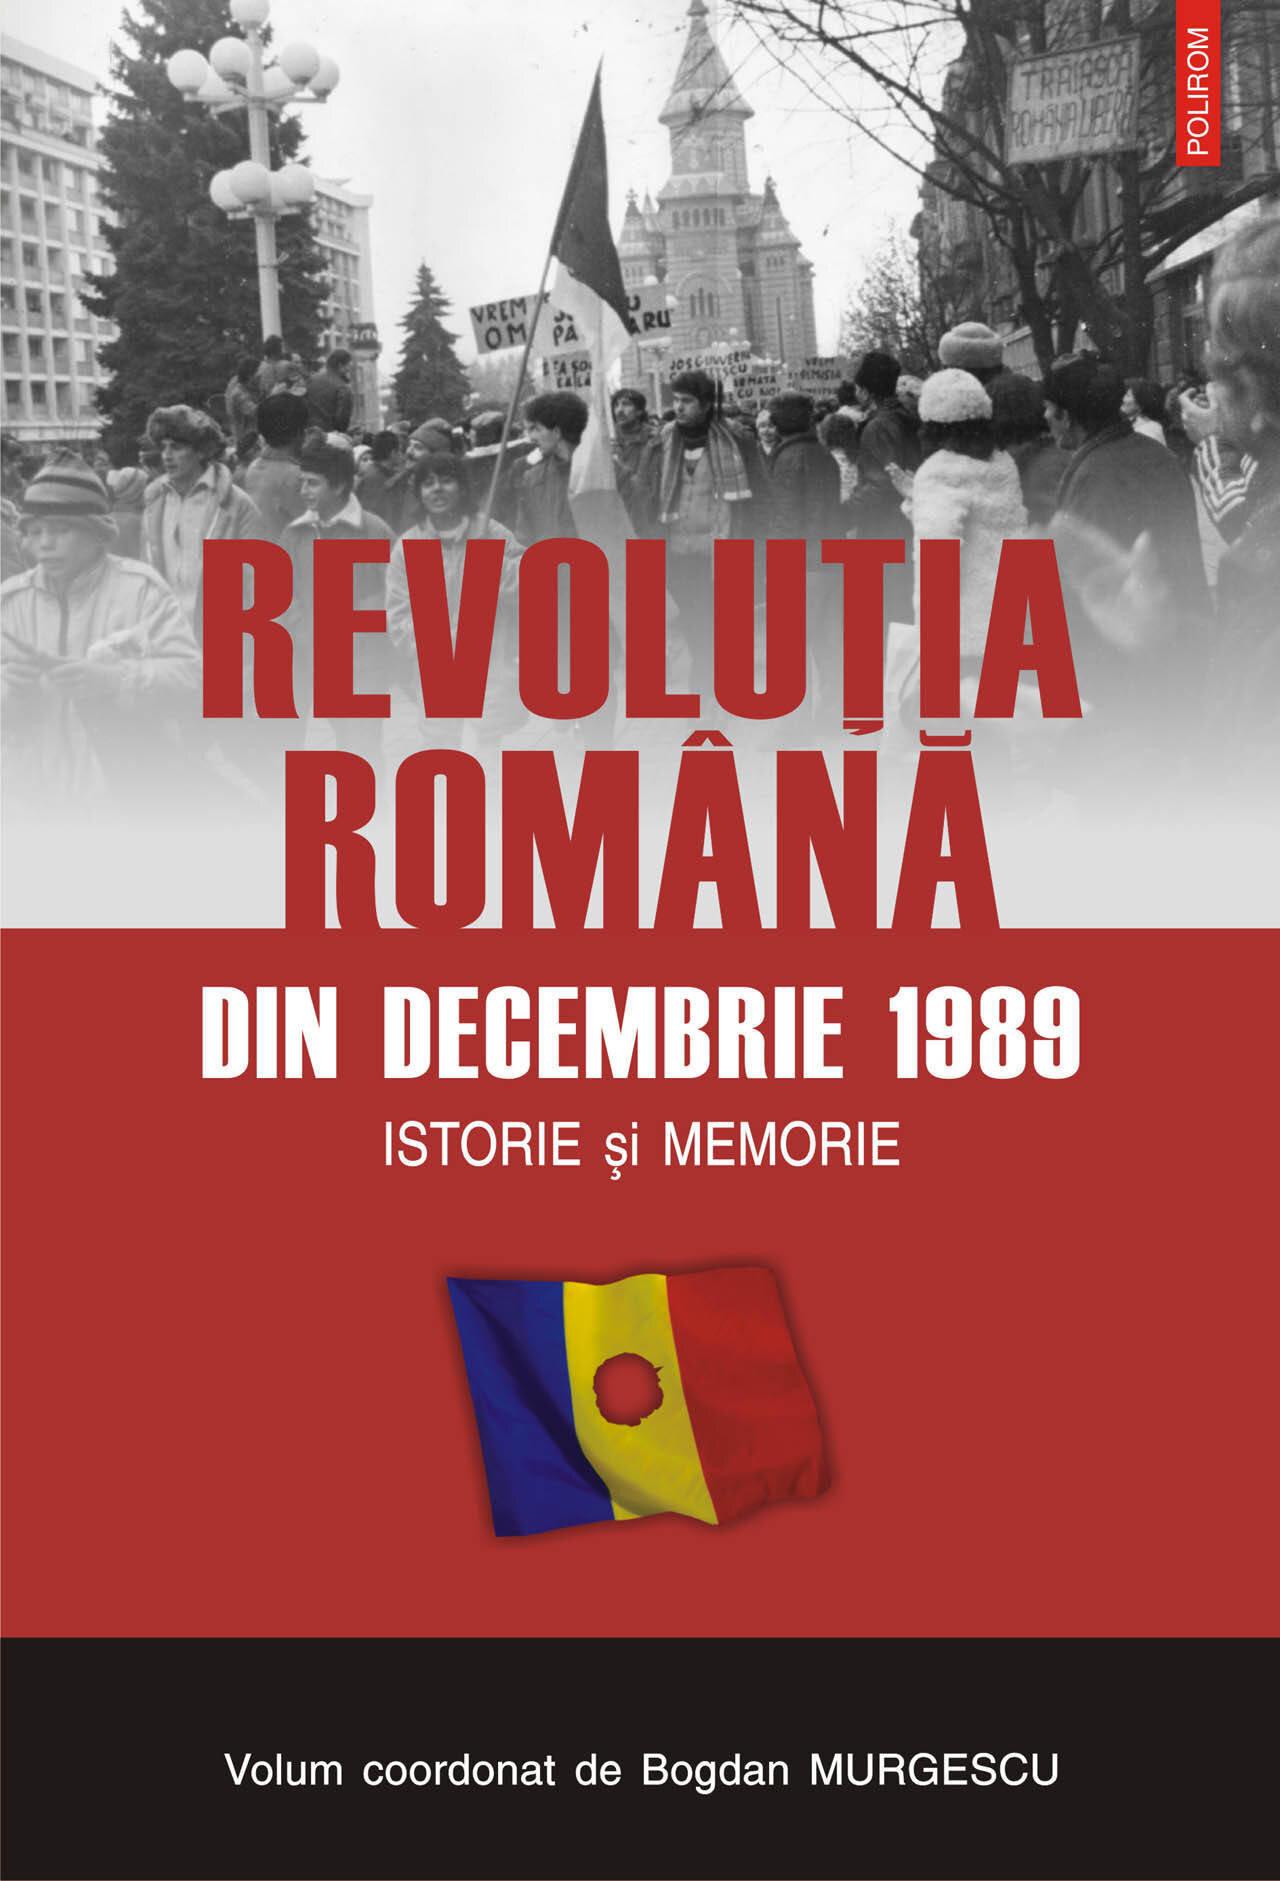 Revolutia romana din decembrie 1989. Istorie si memorie (eBook)